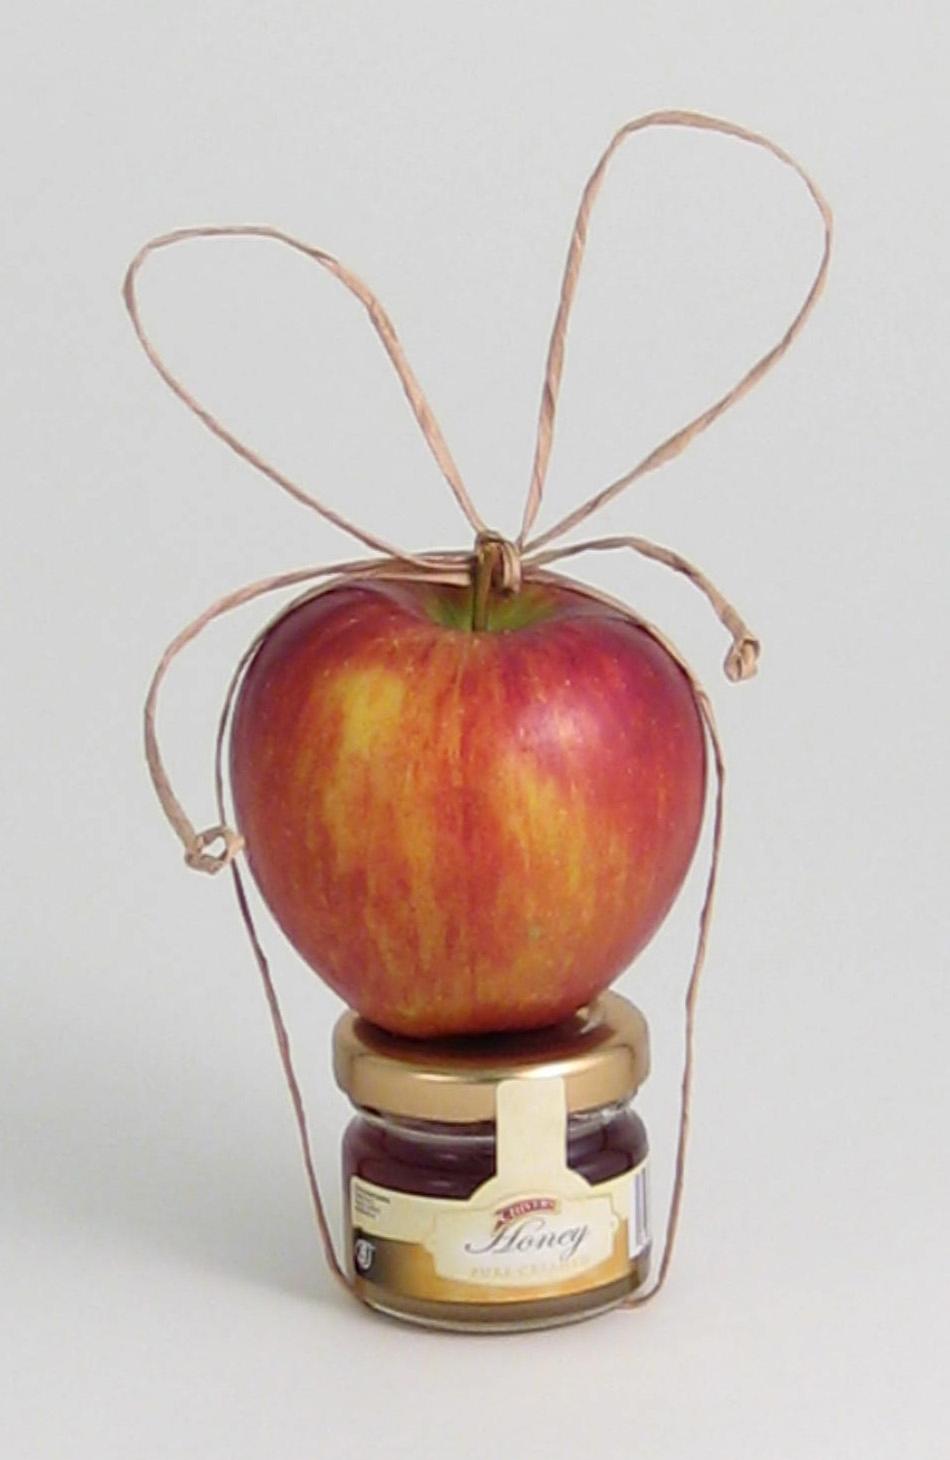 Apple Honey Giftwrap